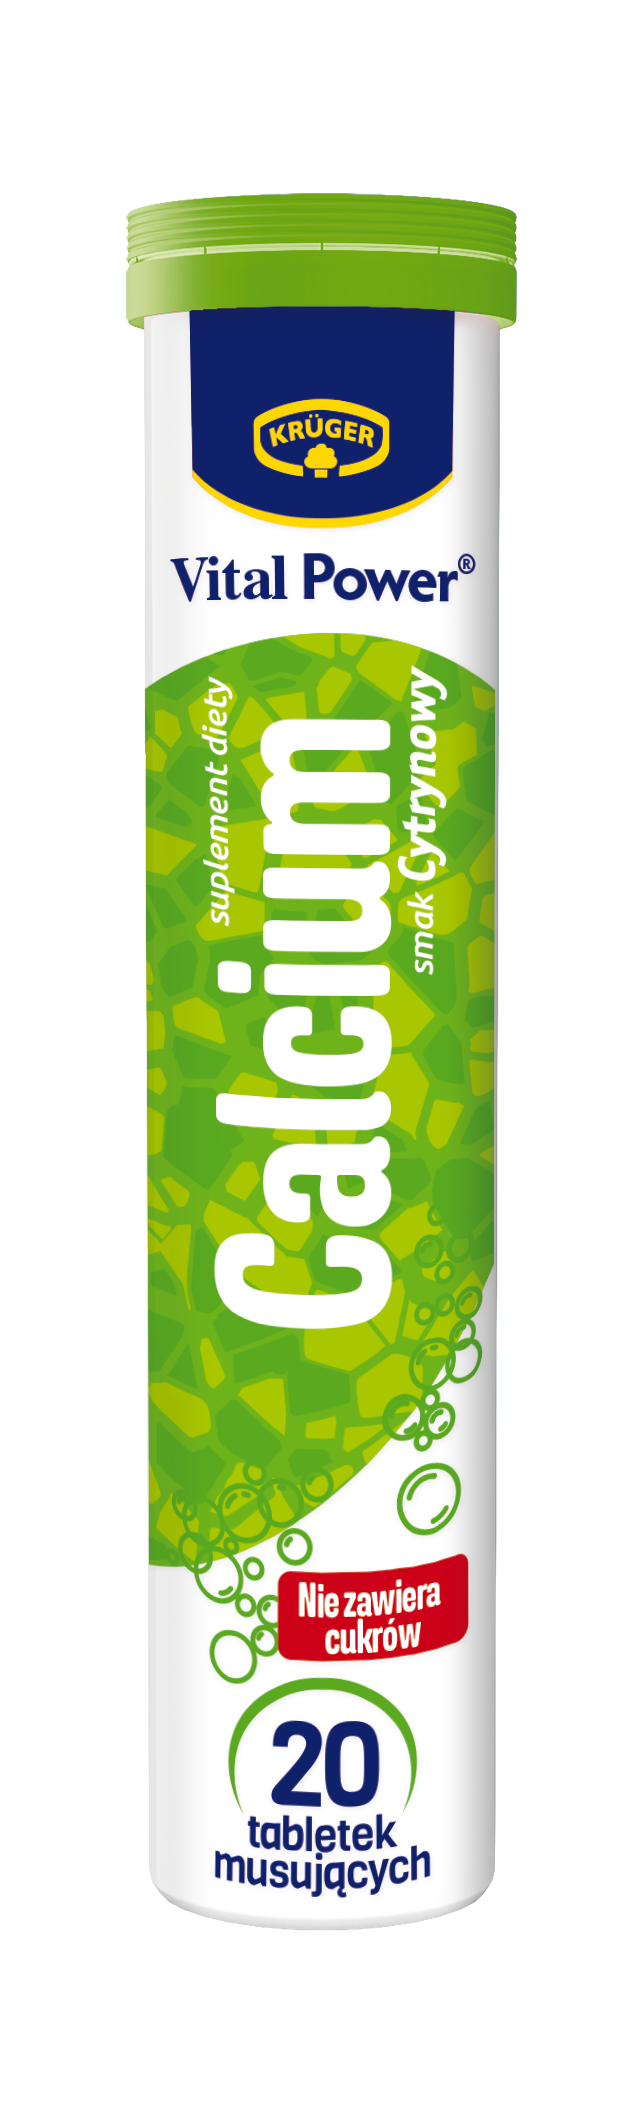 Krüger Calcium smak cytrynowy